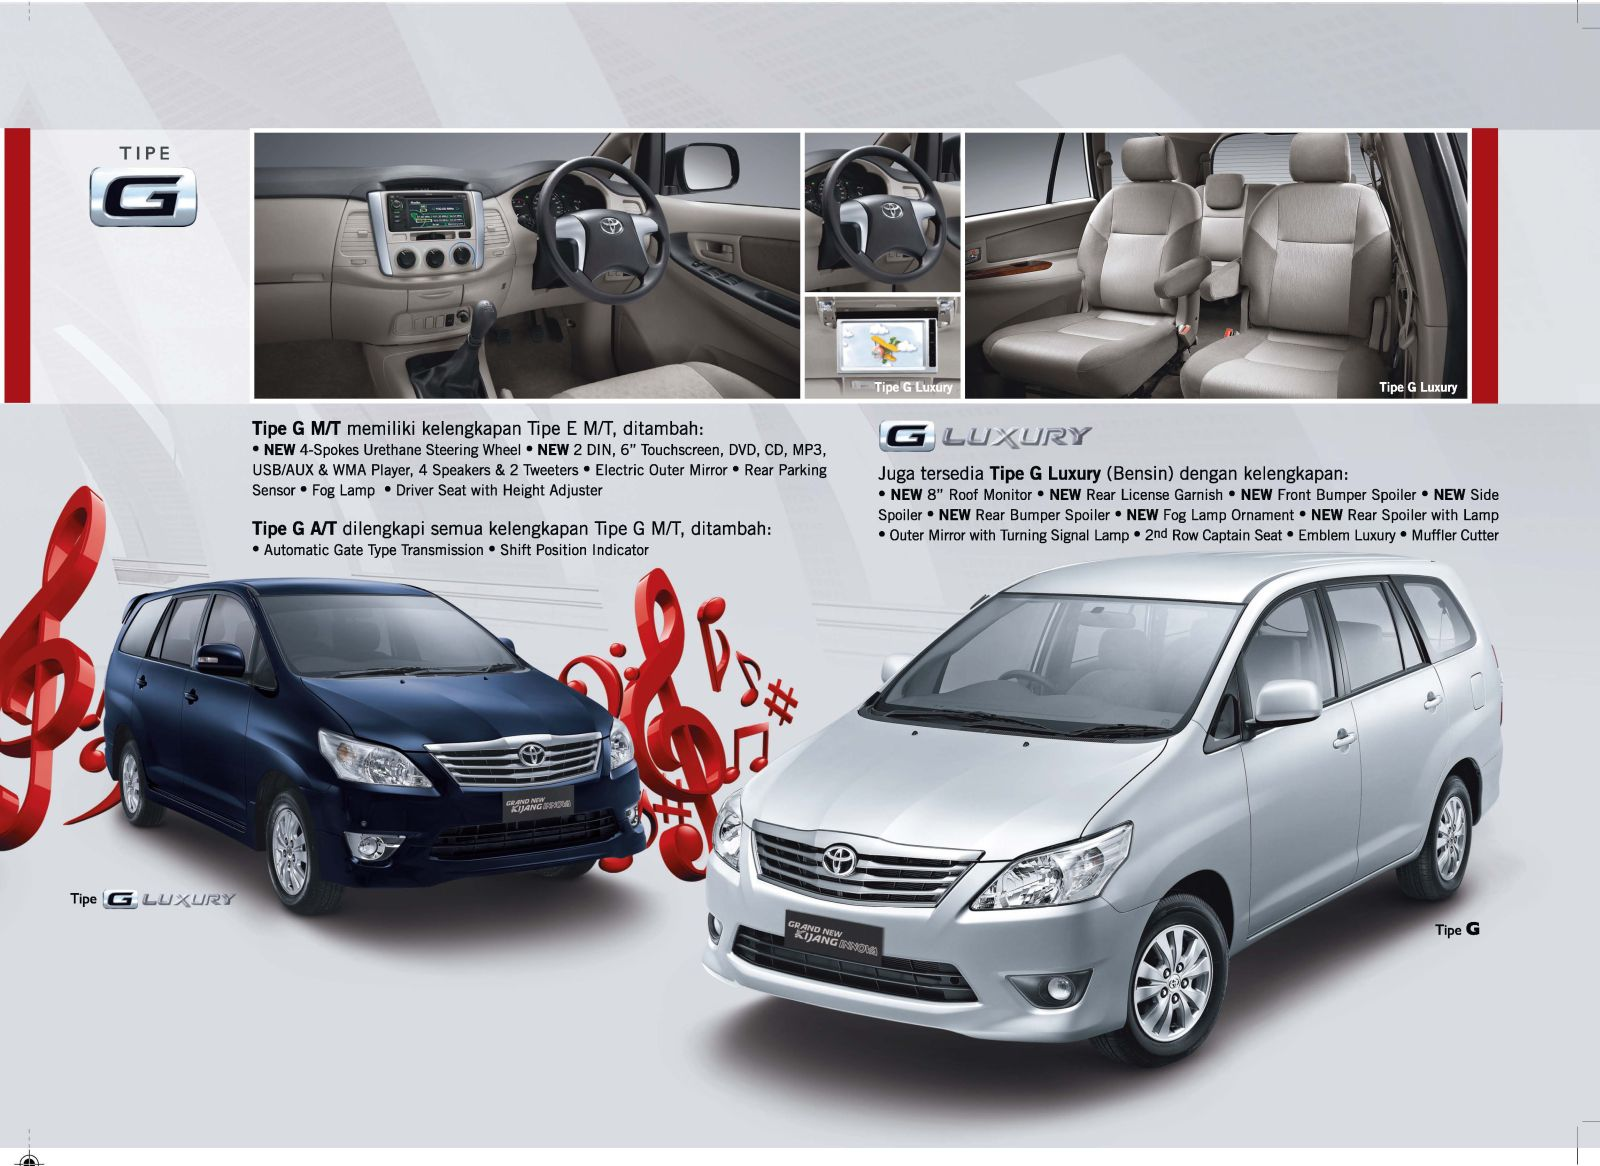 Grand New Avanza Tipe E Abs Dashboard Brosur Kijang Innova Pesta Diskon Toyota